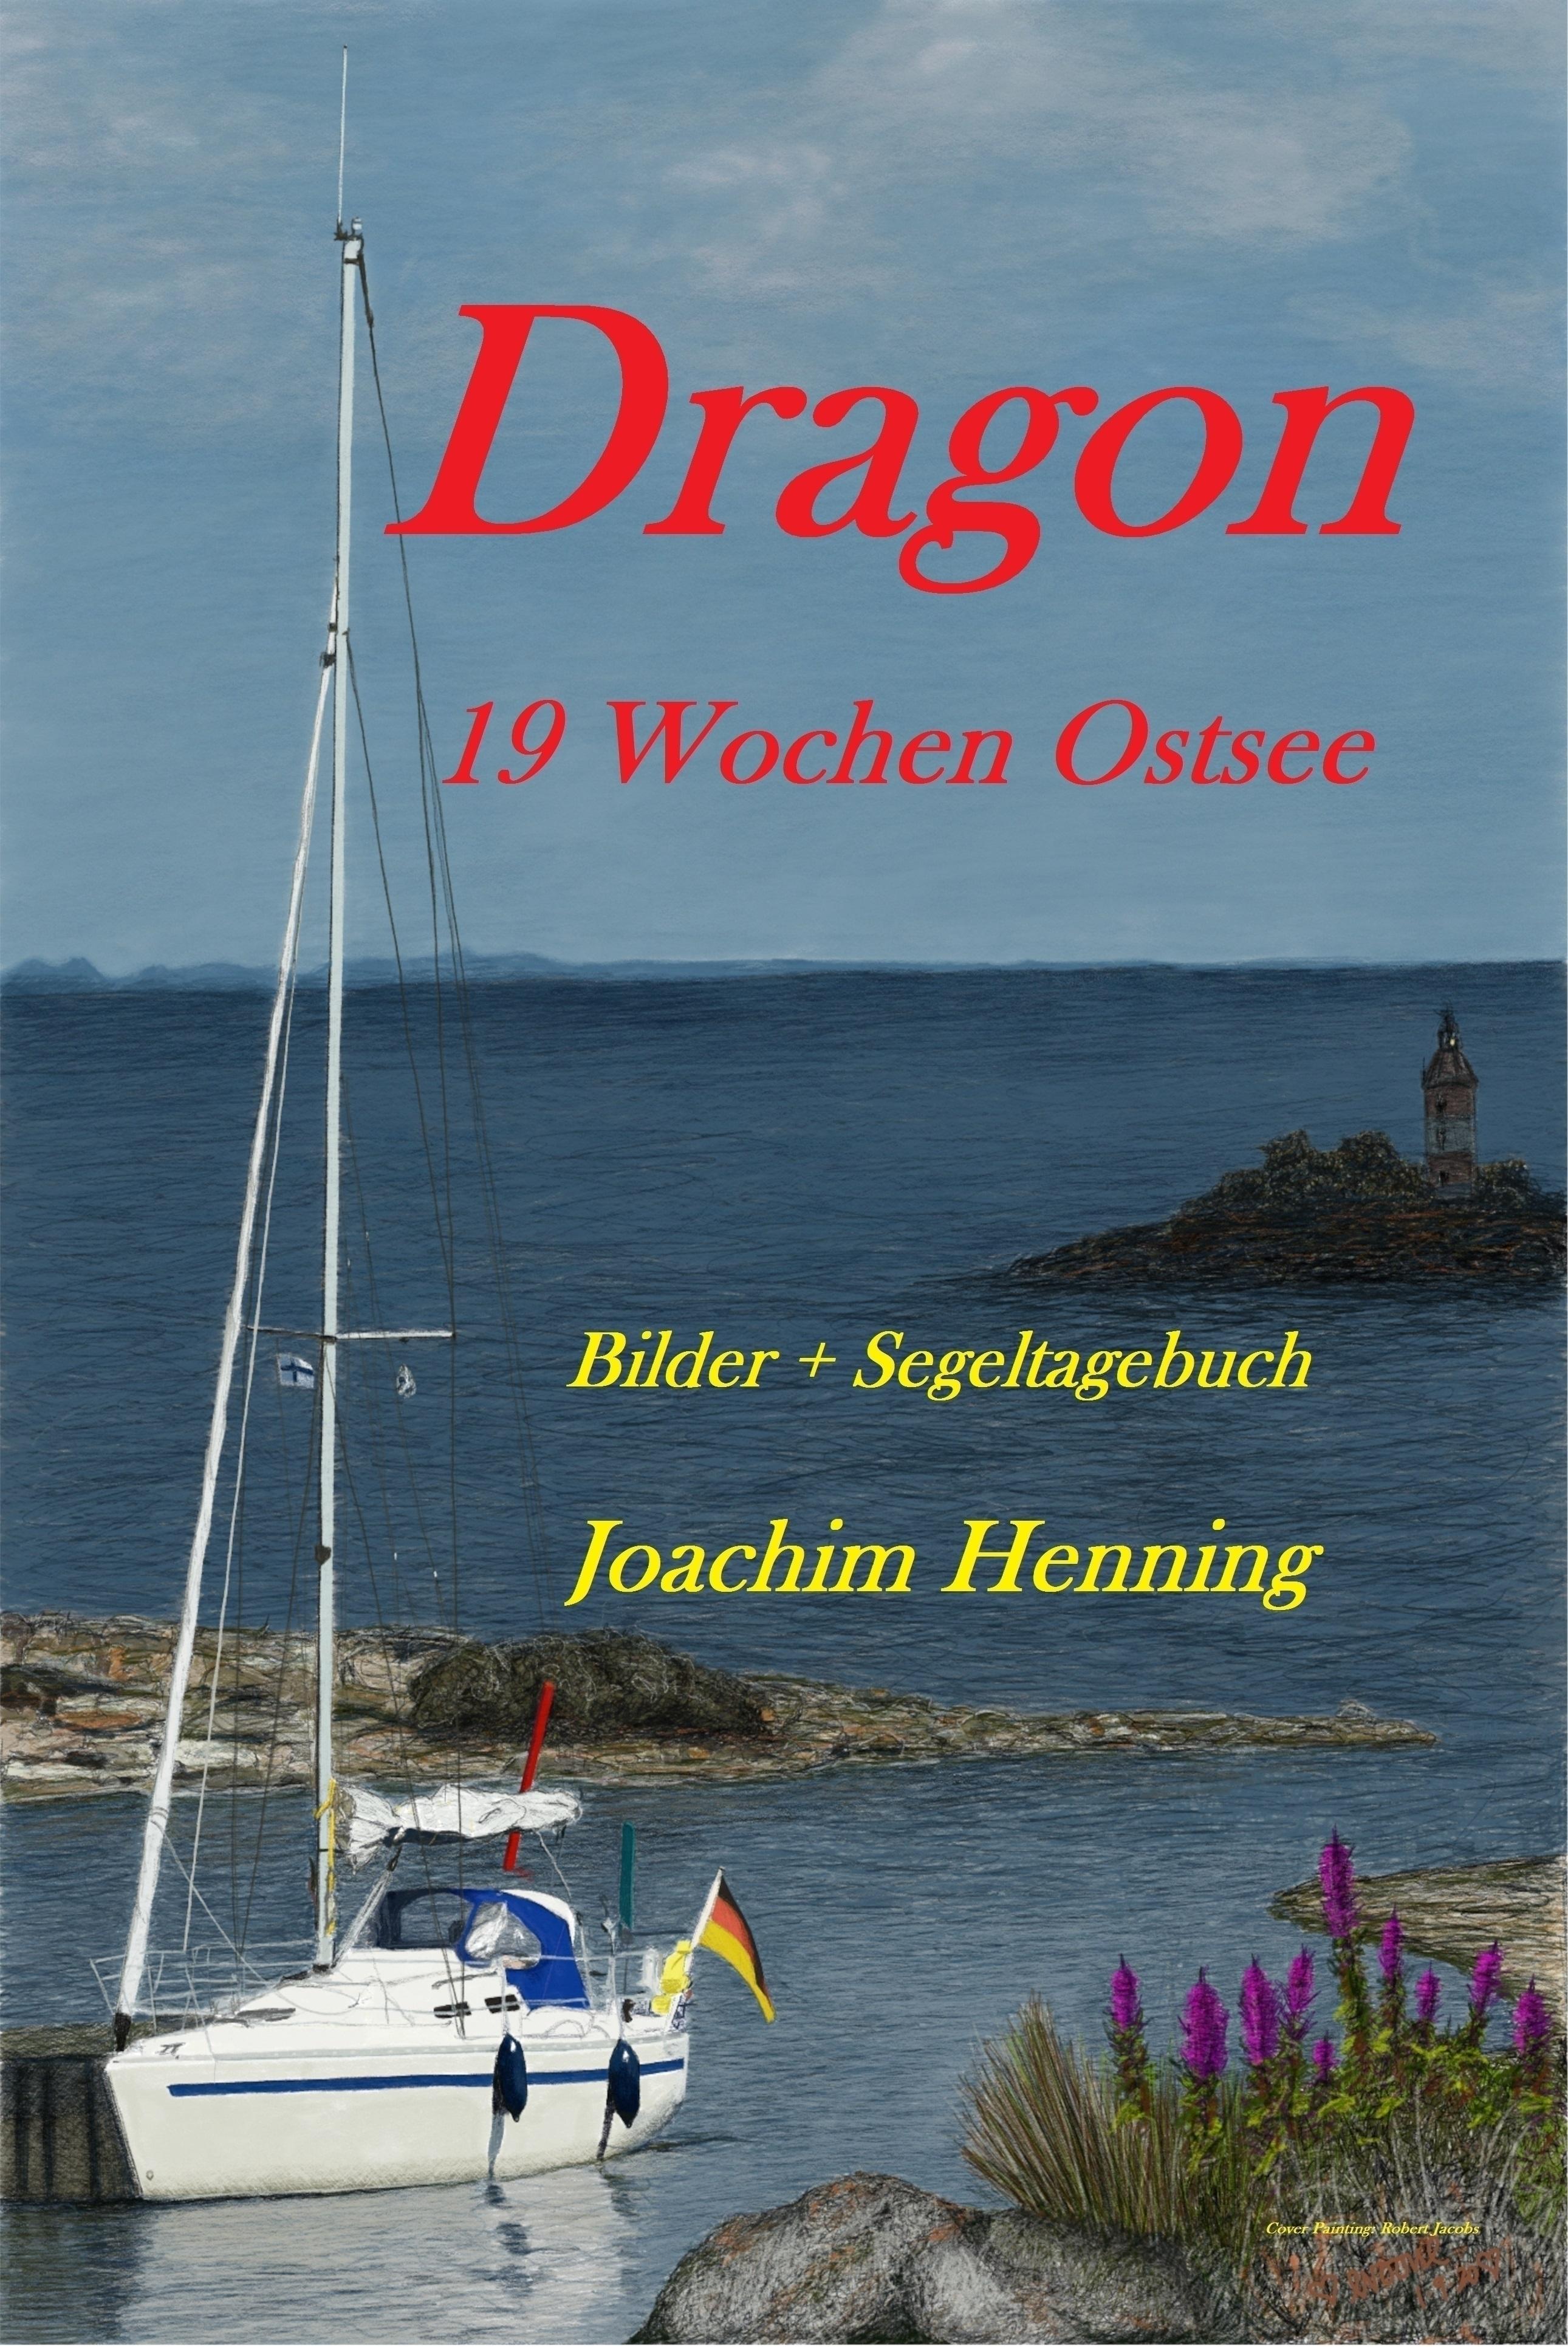 Dragon 19 Wochen Ostsee